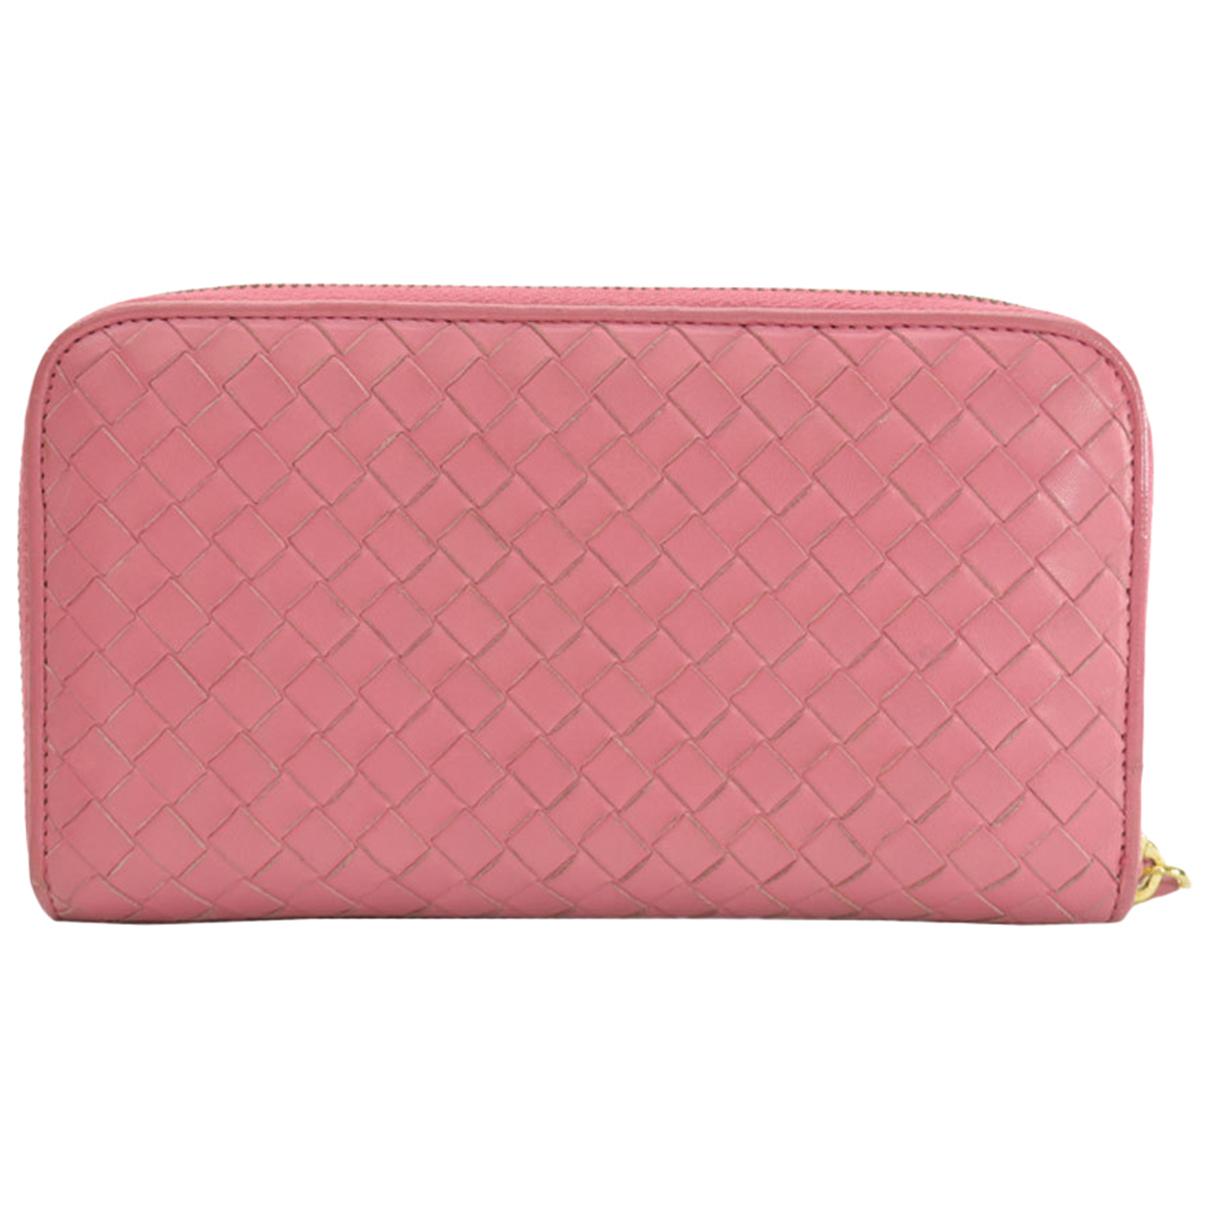 Bottega Veneta - Portefeuille Intrecciato pour femme en cuir - rose